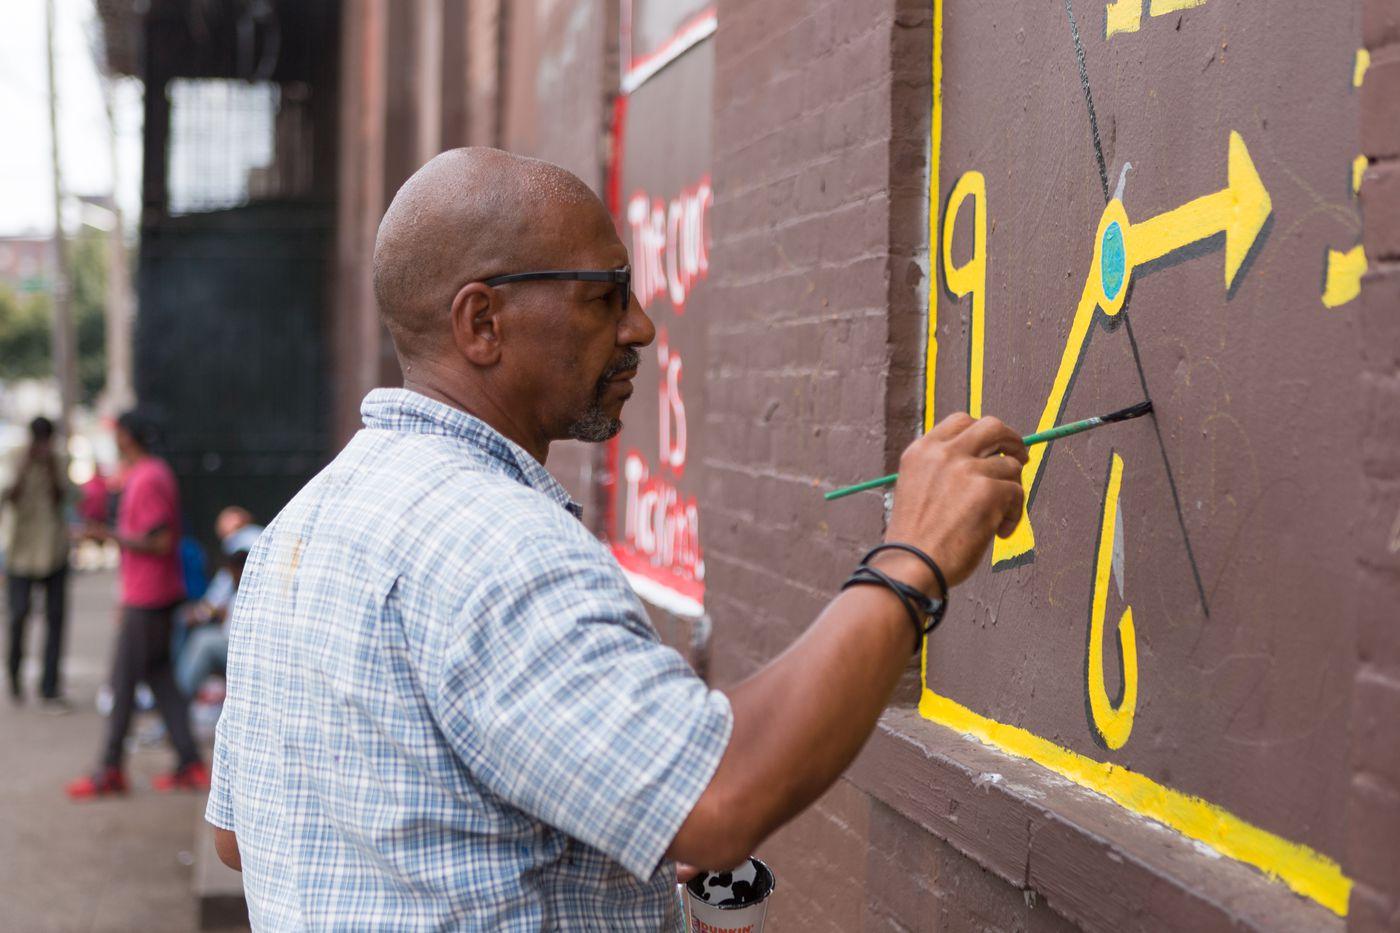 Philadelphia Public Art Project